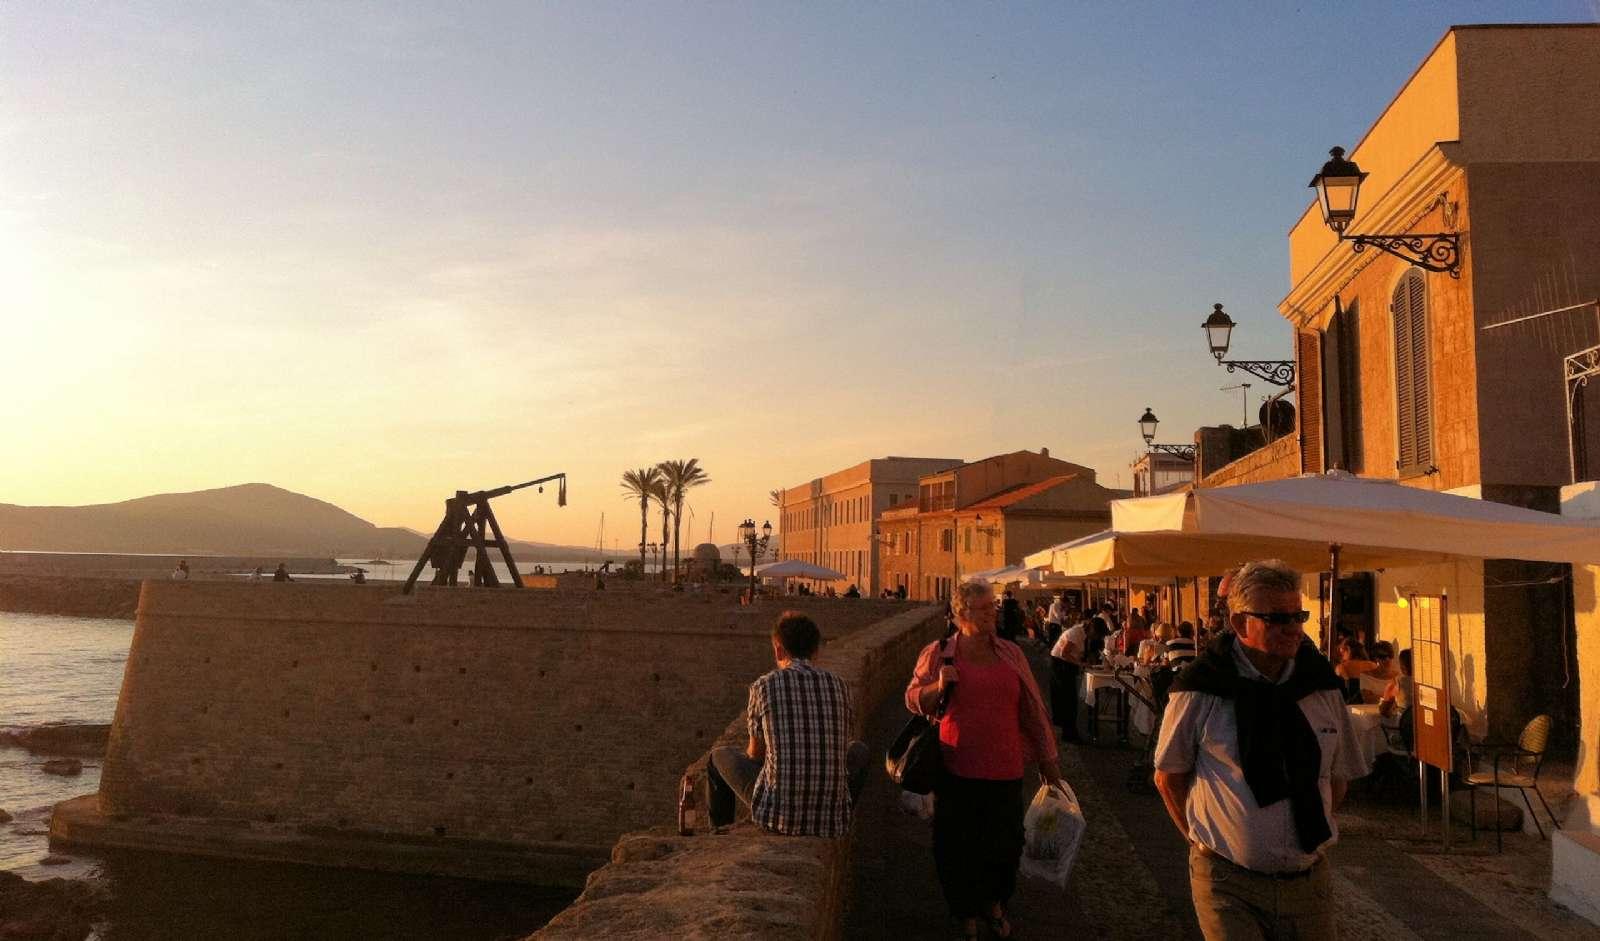 Lively restaurant scene down at the shore